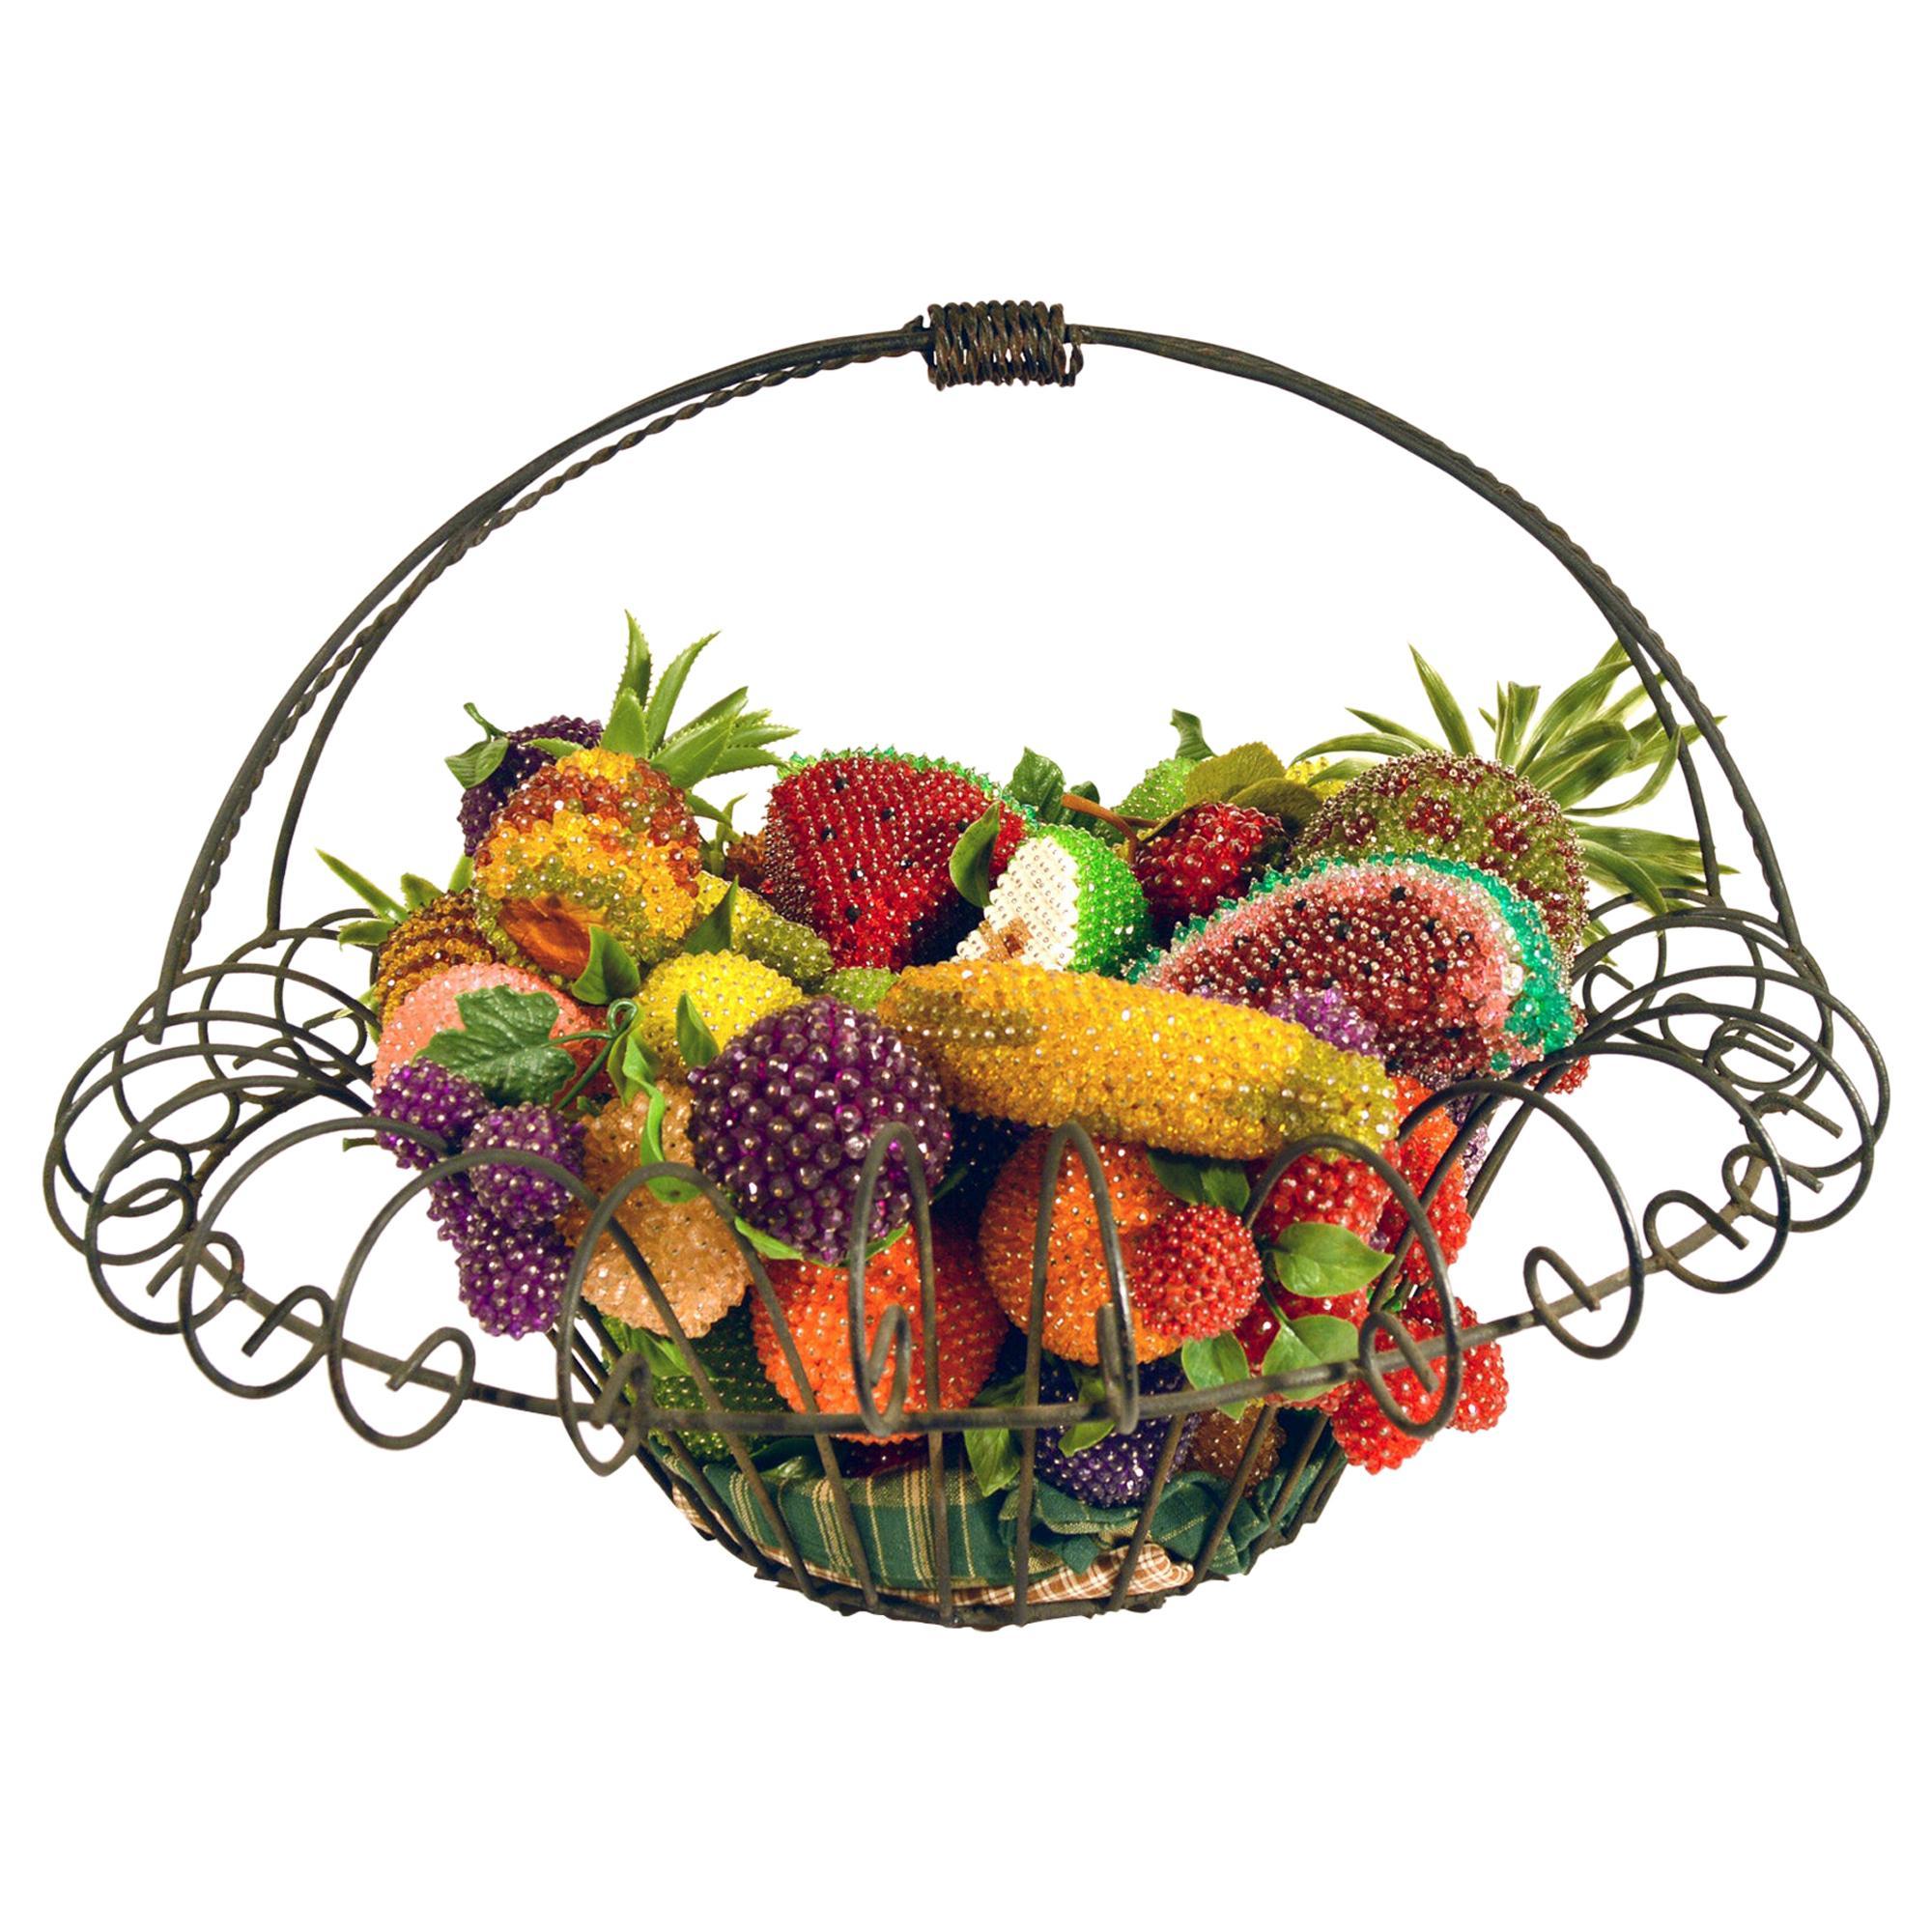 American Folk Art Metal Basket of Beaded Fruit, Basket, Early 20th Century